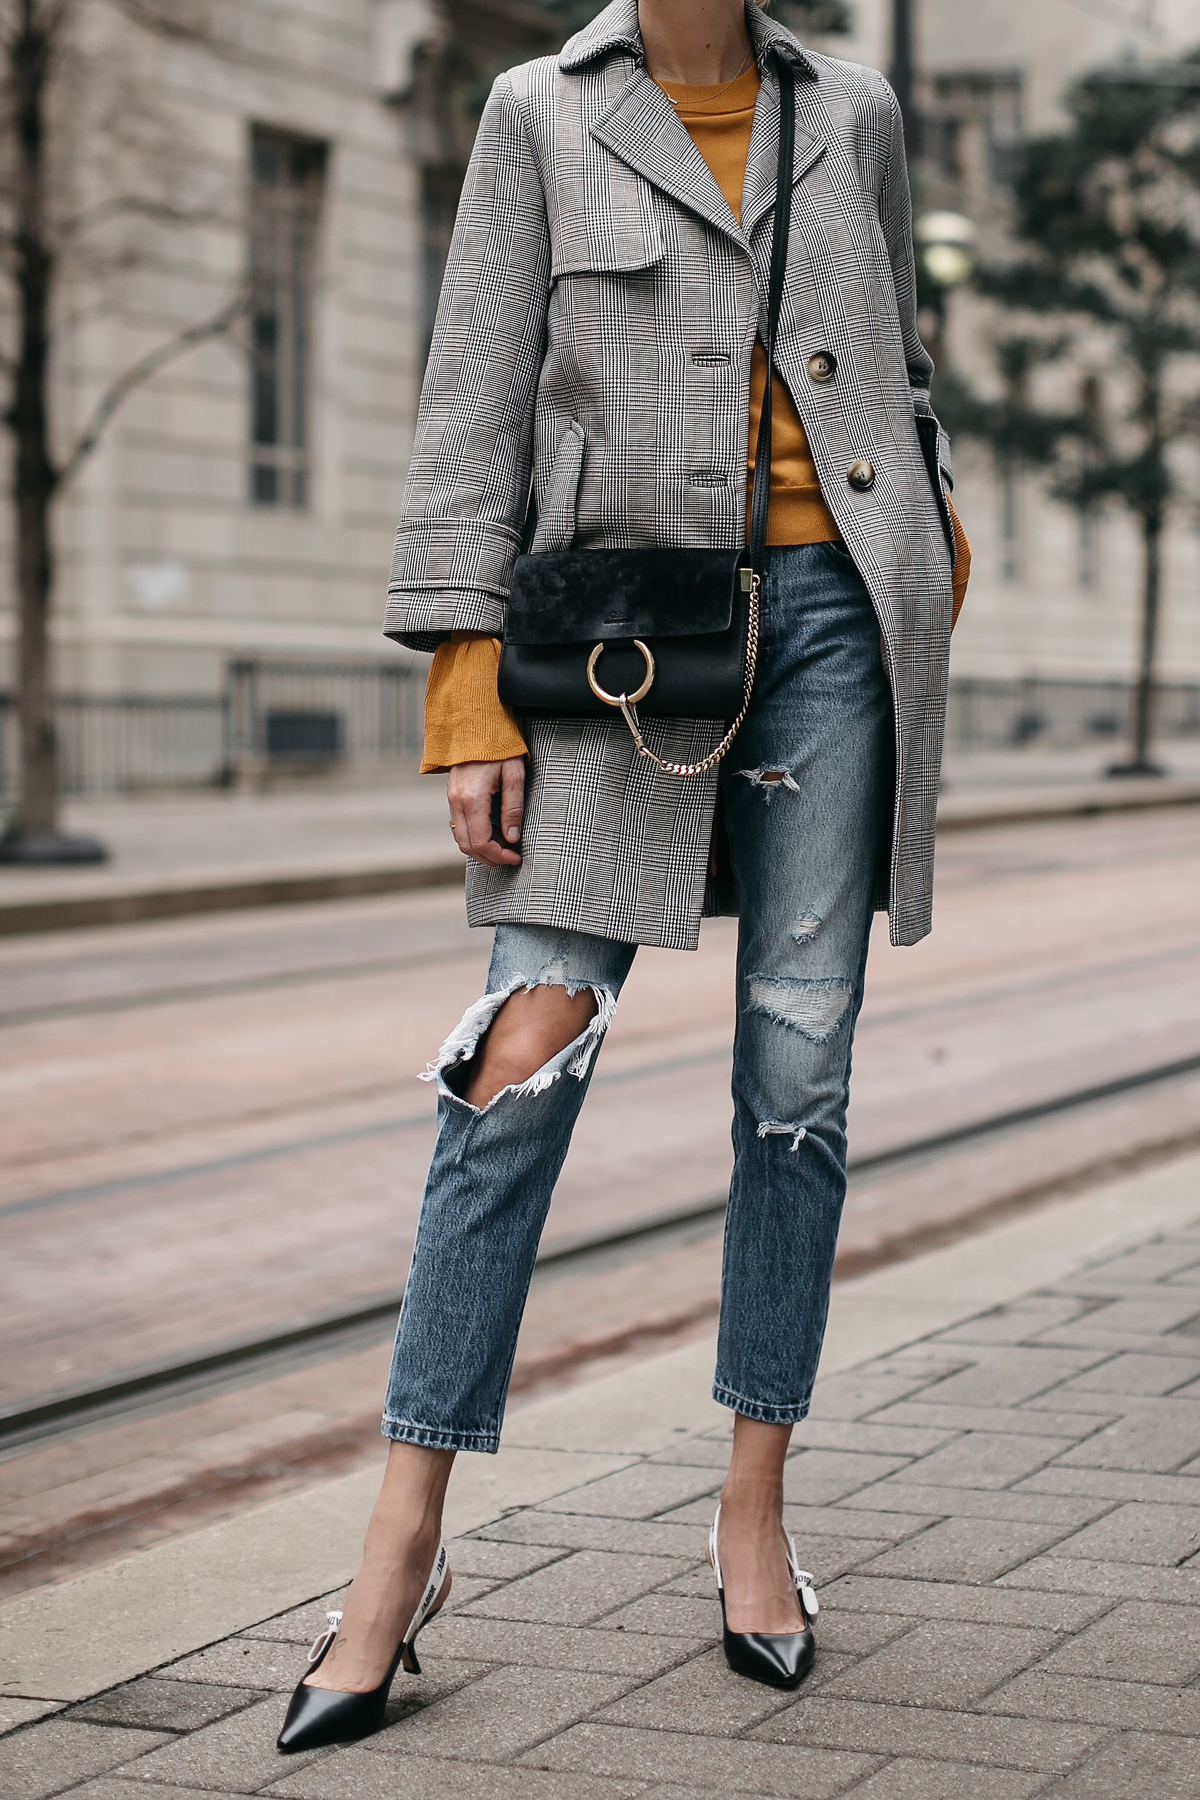 Topshop Plaid Trench Coat Marigold Sweater Levis Ripped Jeans Dior Slingbacks Chloe Faye Handbag Fashion Jackson Dallas Blogger Fashion Blogger Street Style